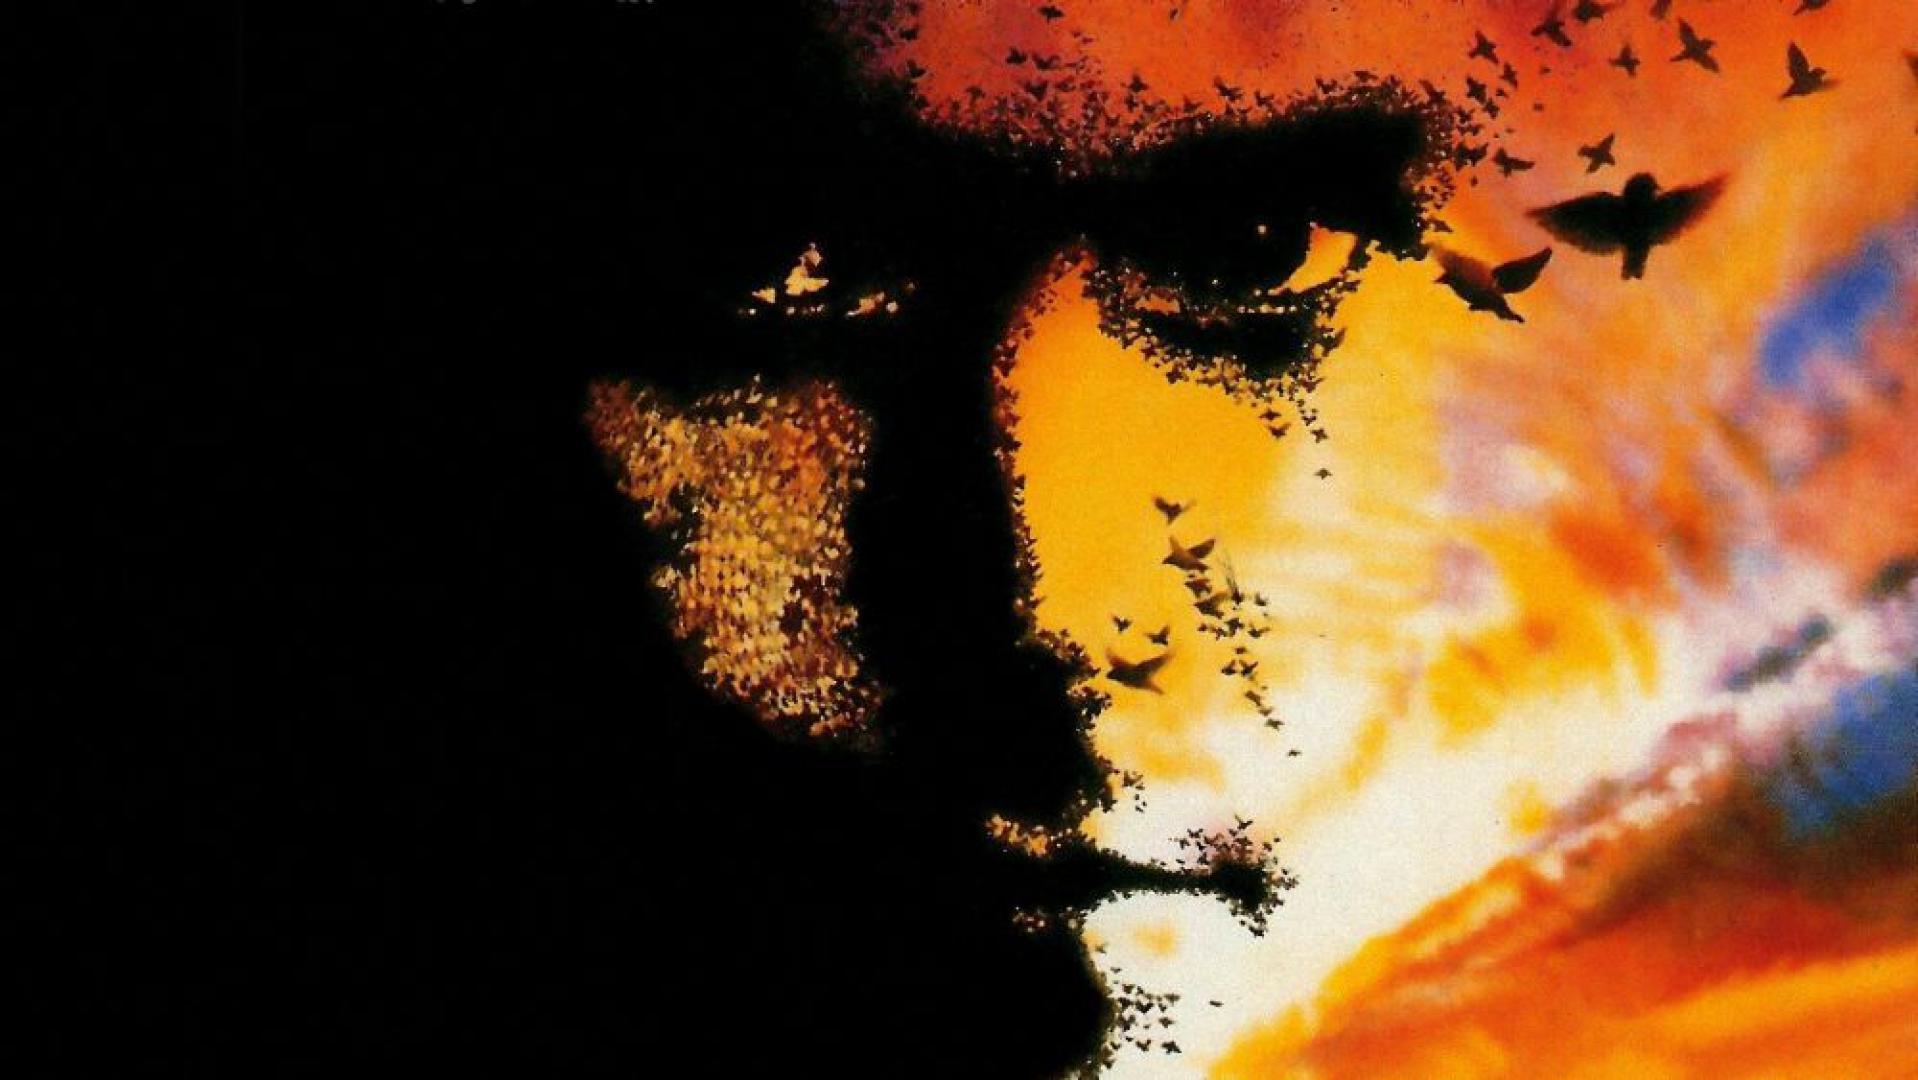 The Dark Half / Halálos árnyék (1989/1993)